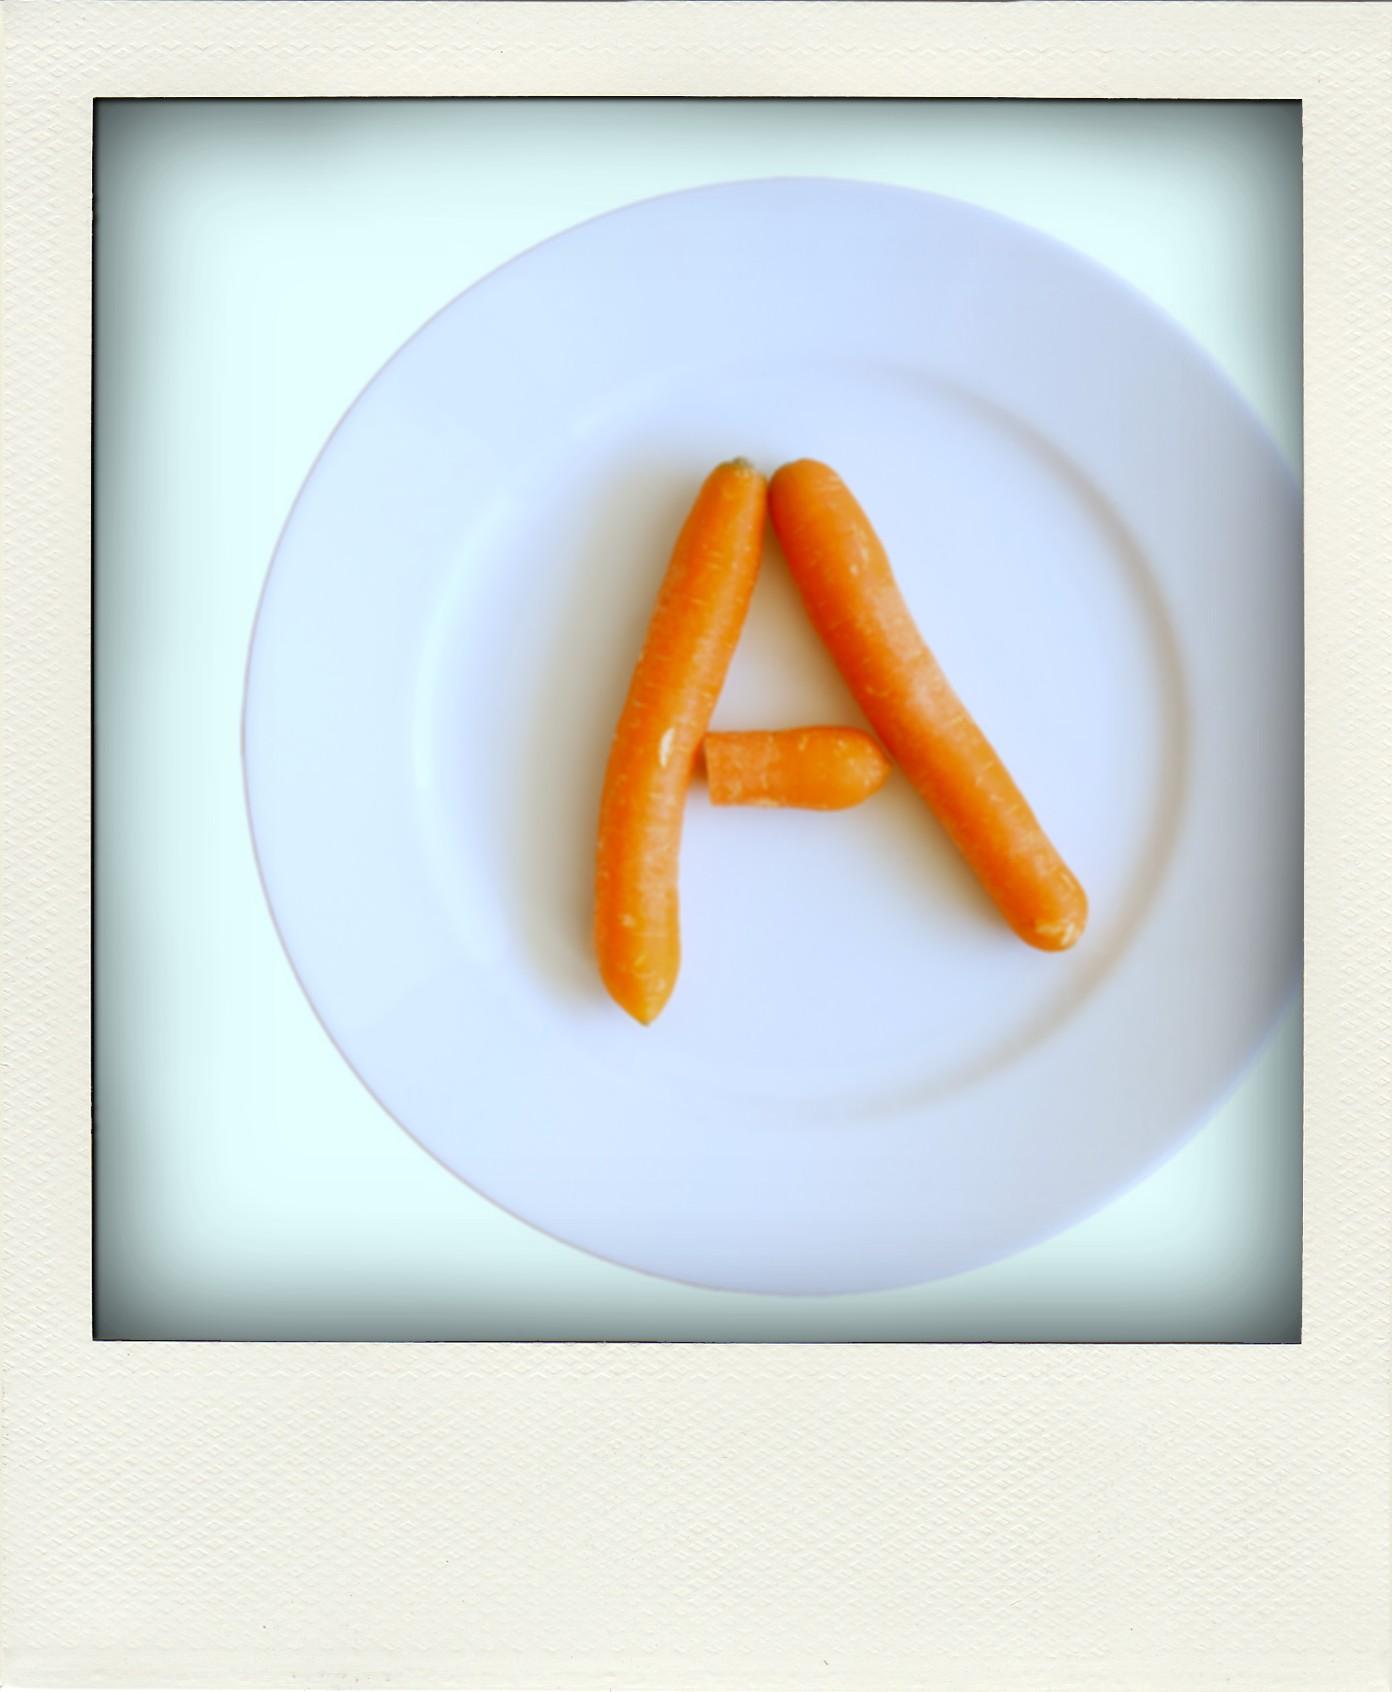 The Vegan ABC - A